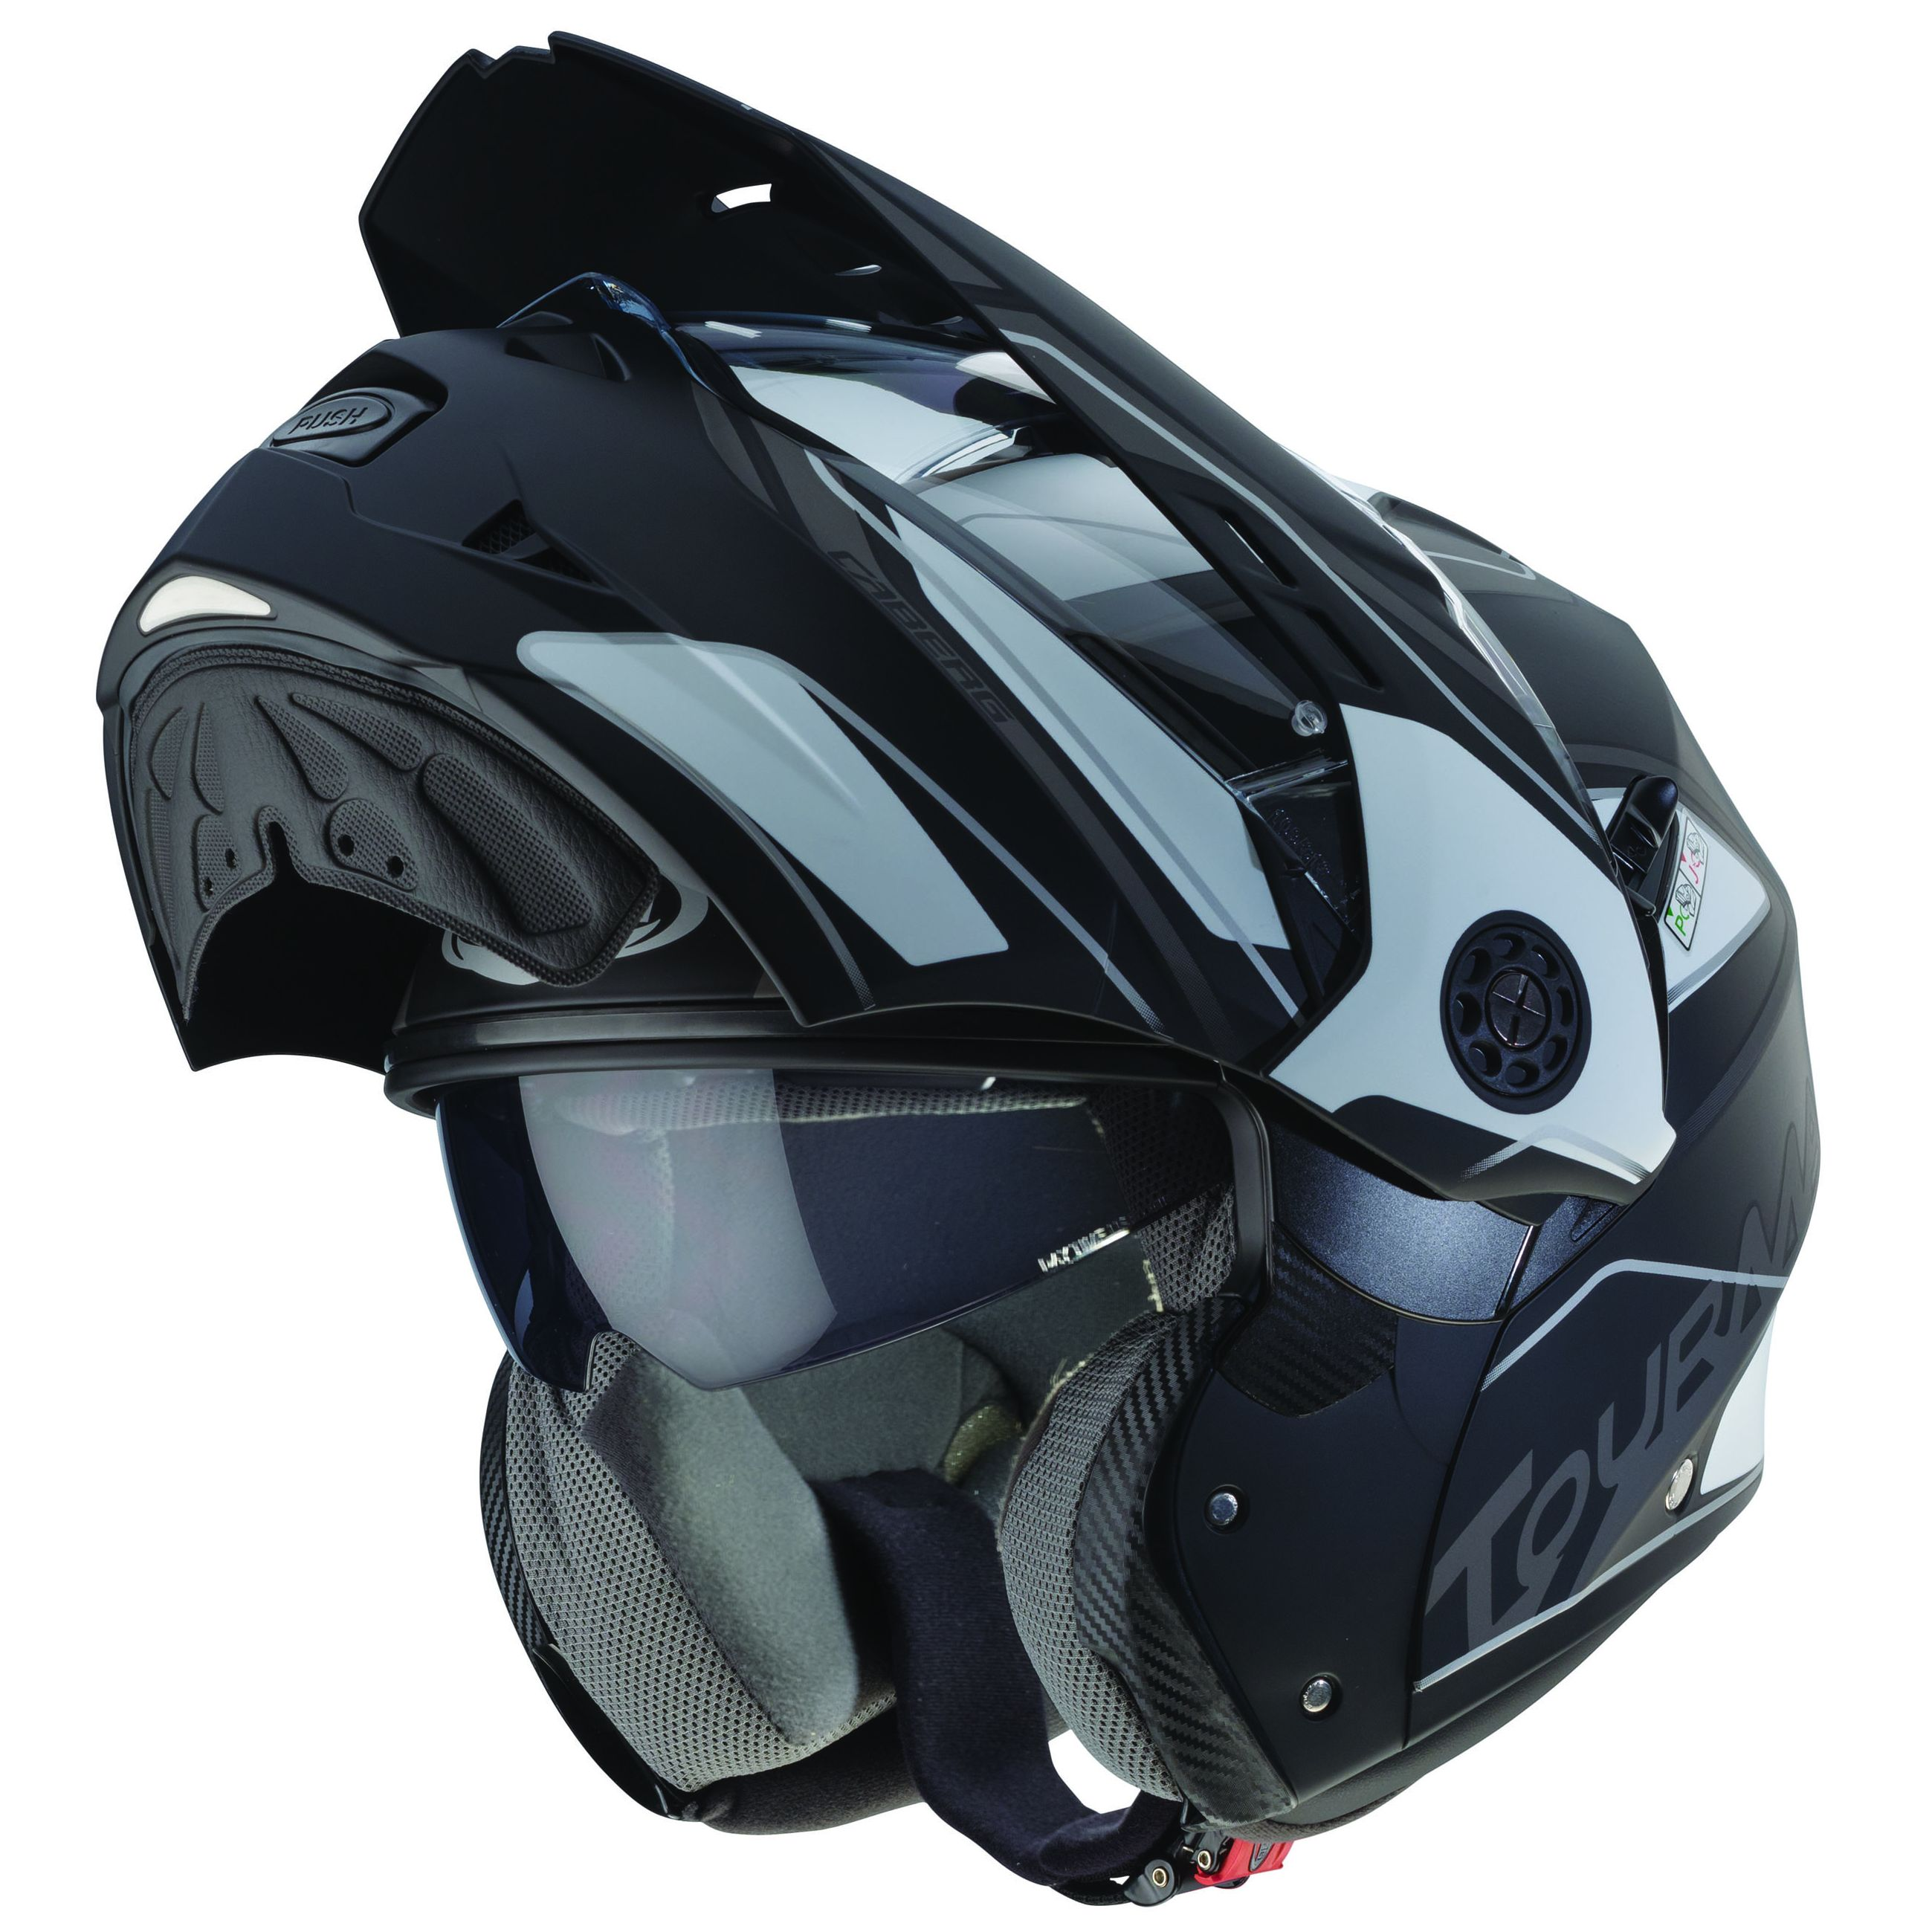 Casque Caberg Tourmax mat noir enduro motard touring moto